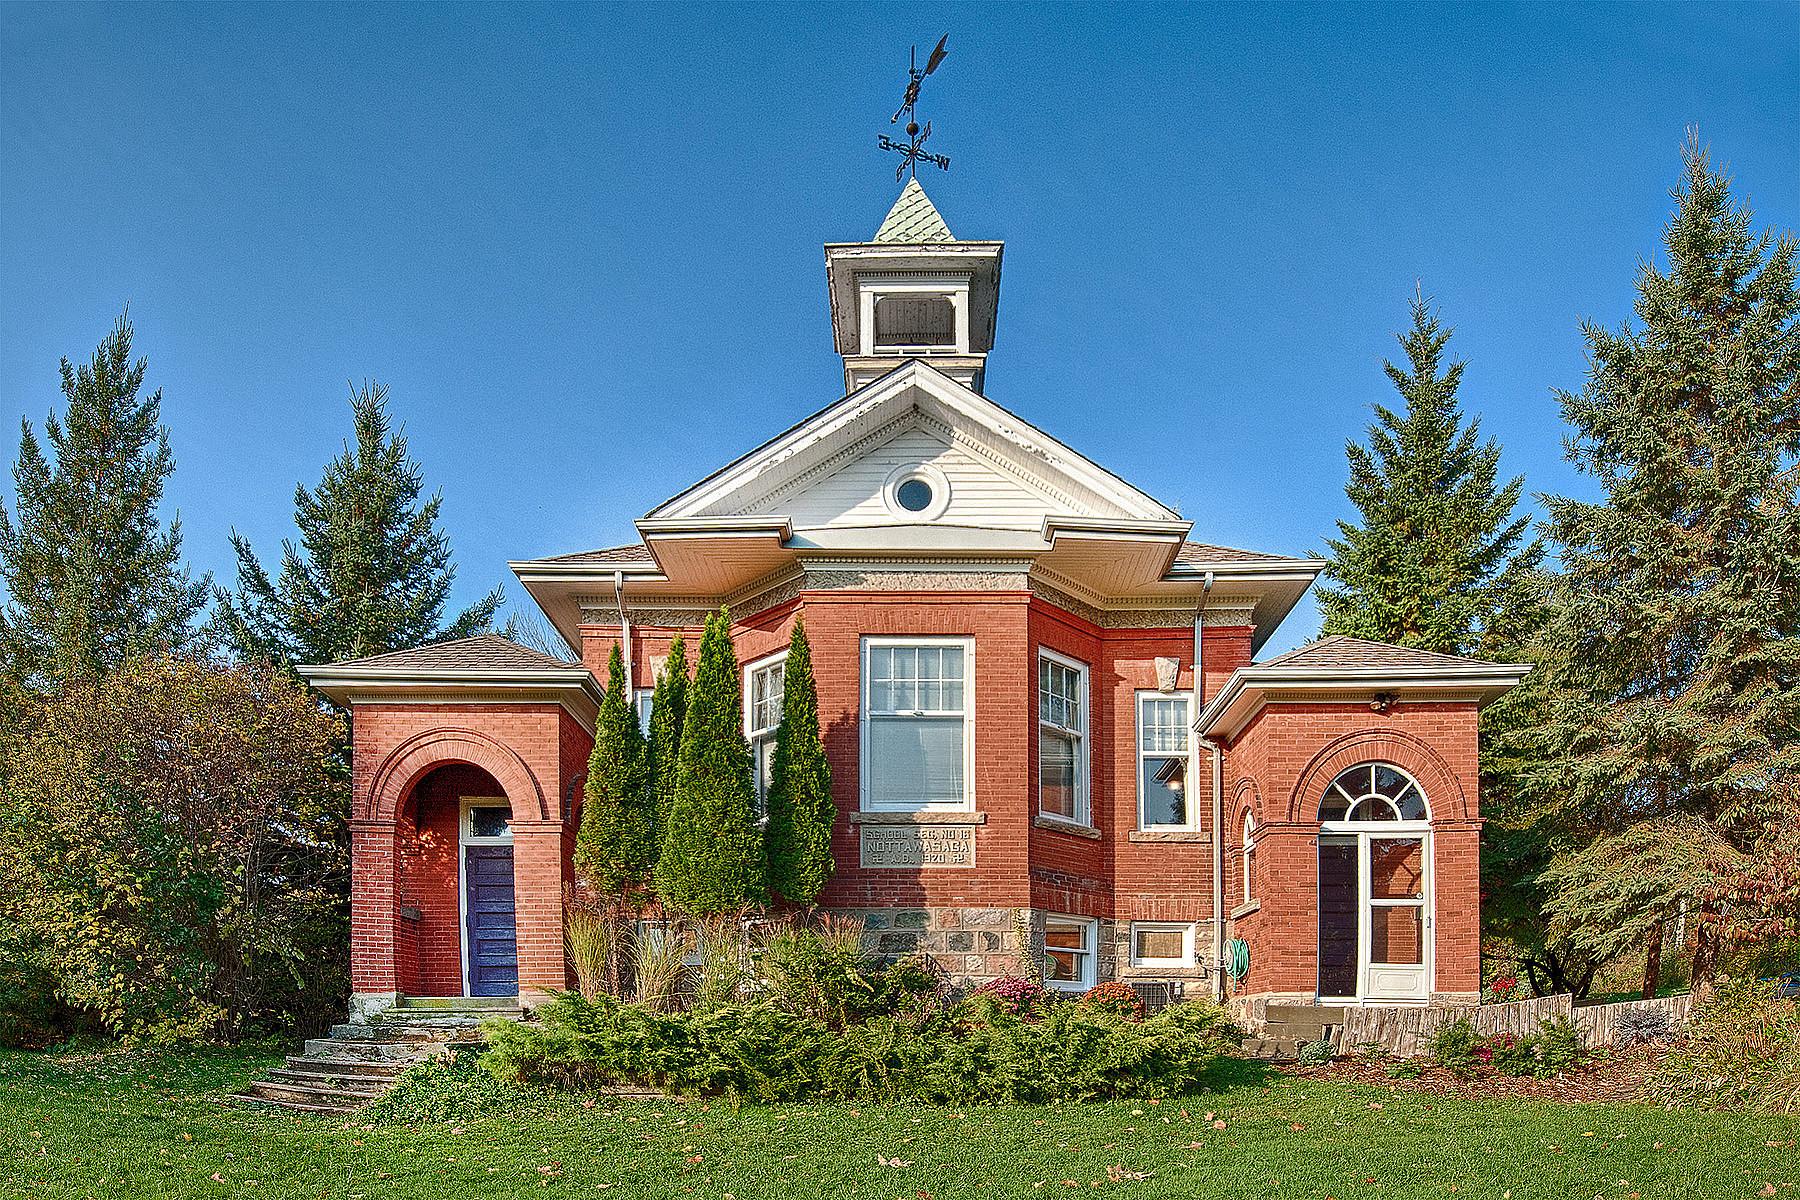 واحد منزل الأسرة للـ Sale في Unique School House 2346 8 Nottawasaga Con S, Creemore, Ontario, L0M 1L0 Canada